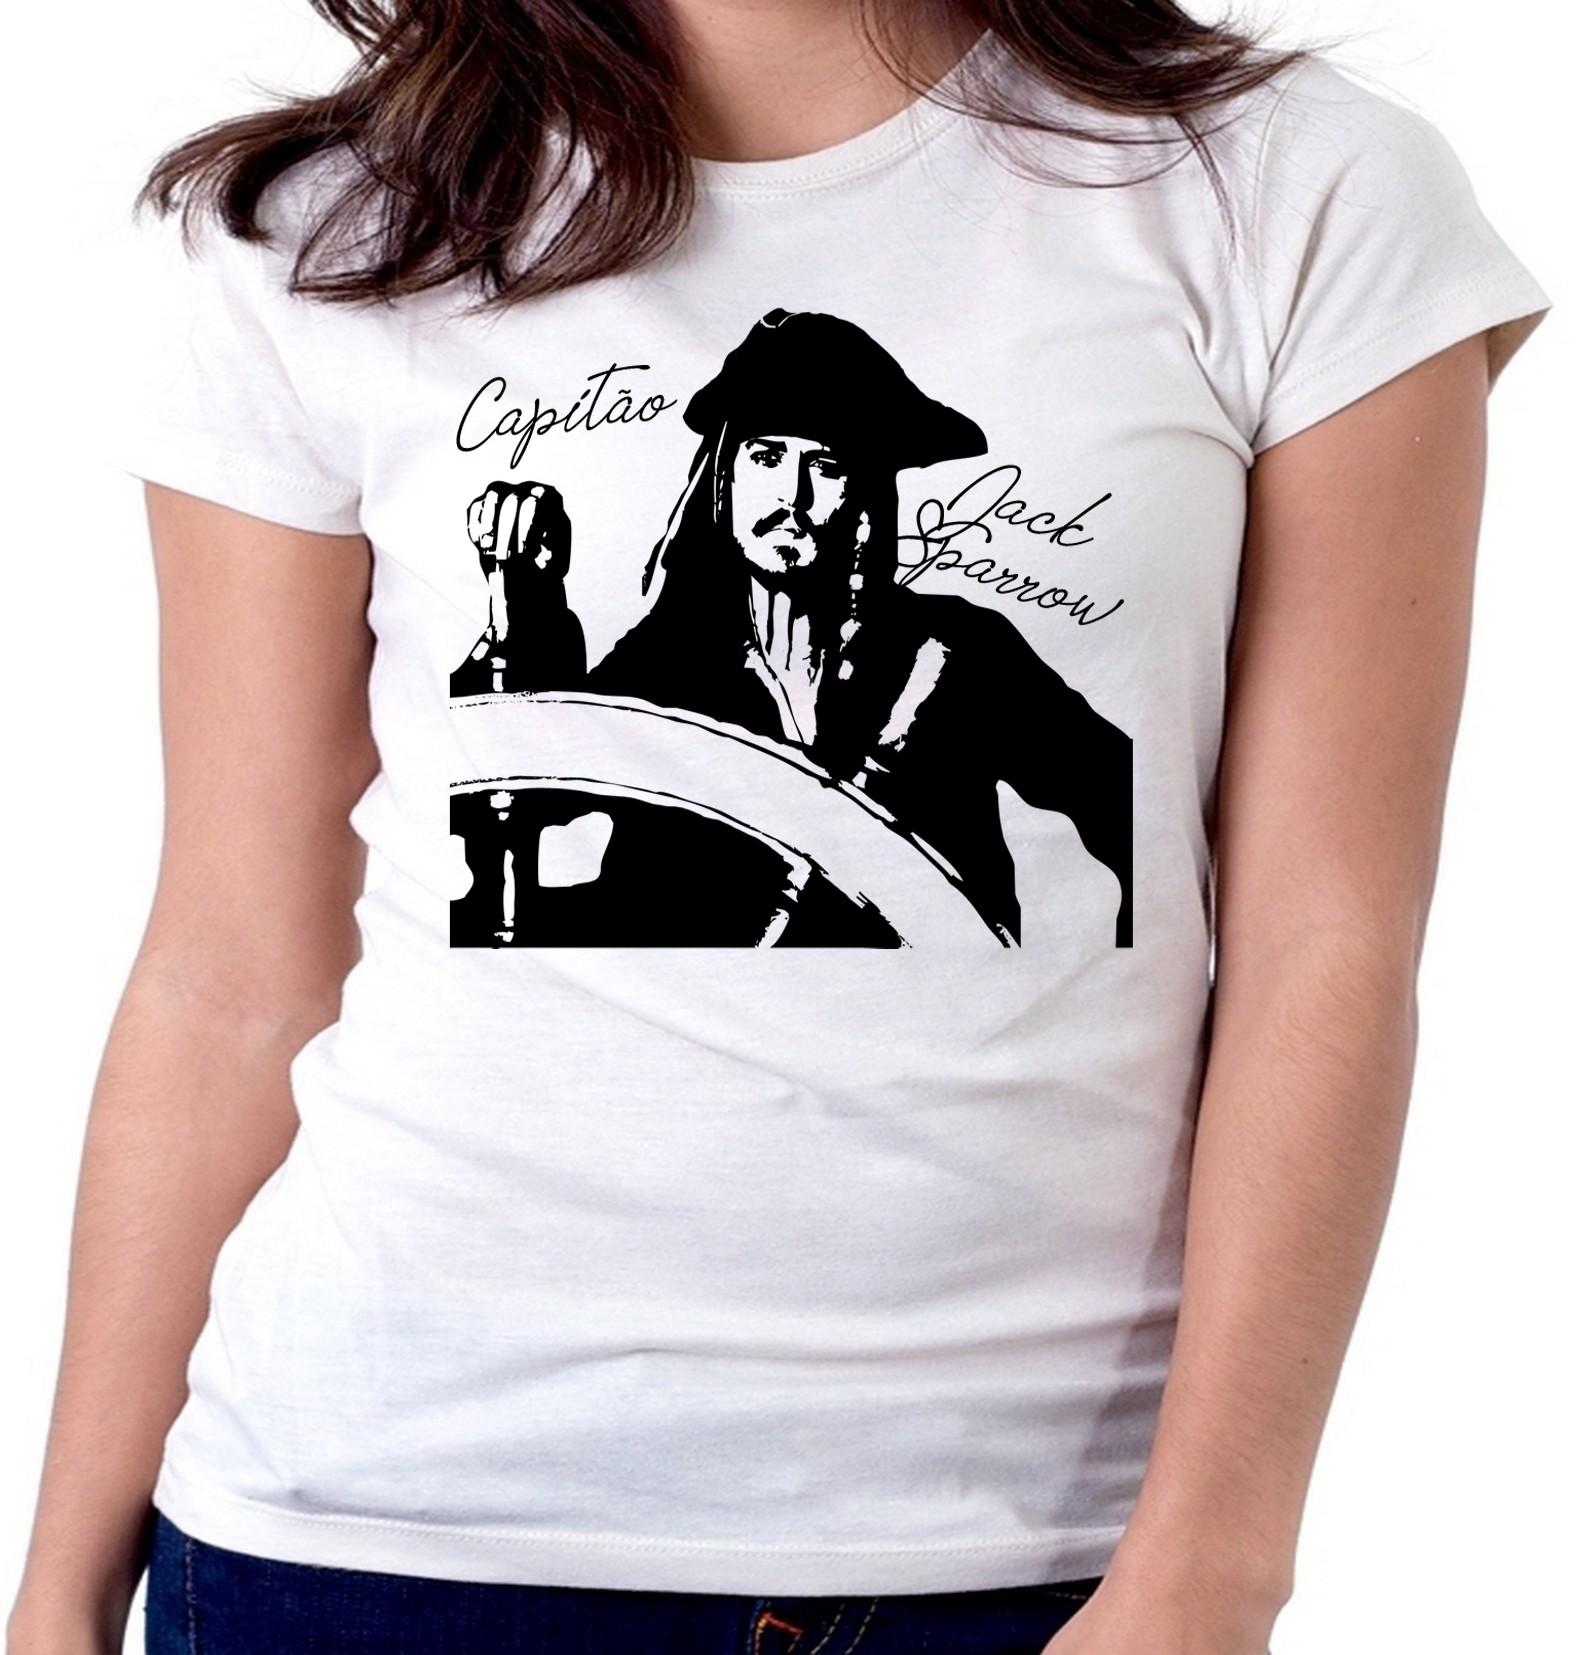 5a51c40680 Camiseta Feminina Barco Pirata